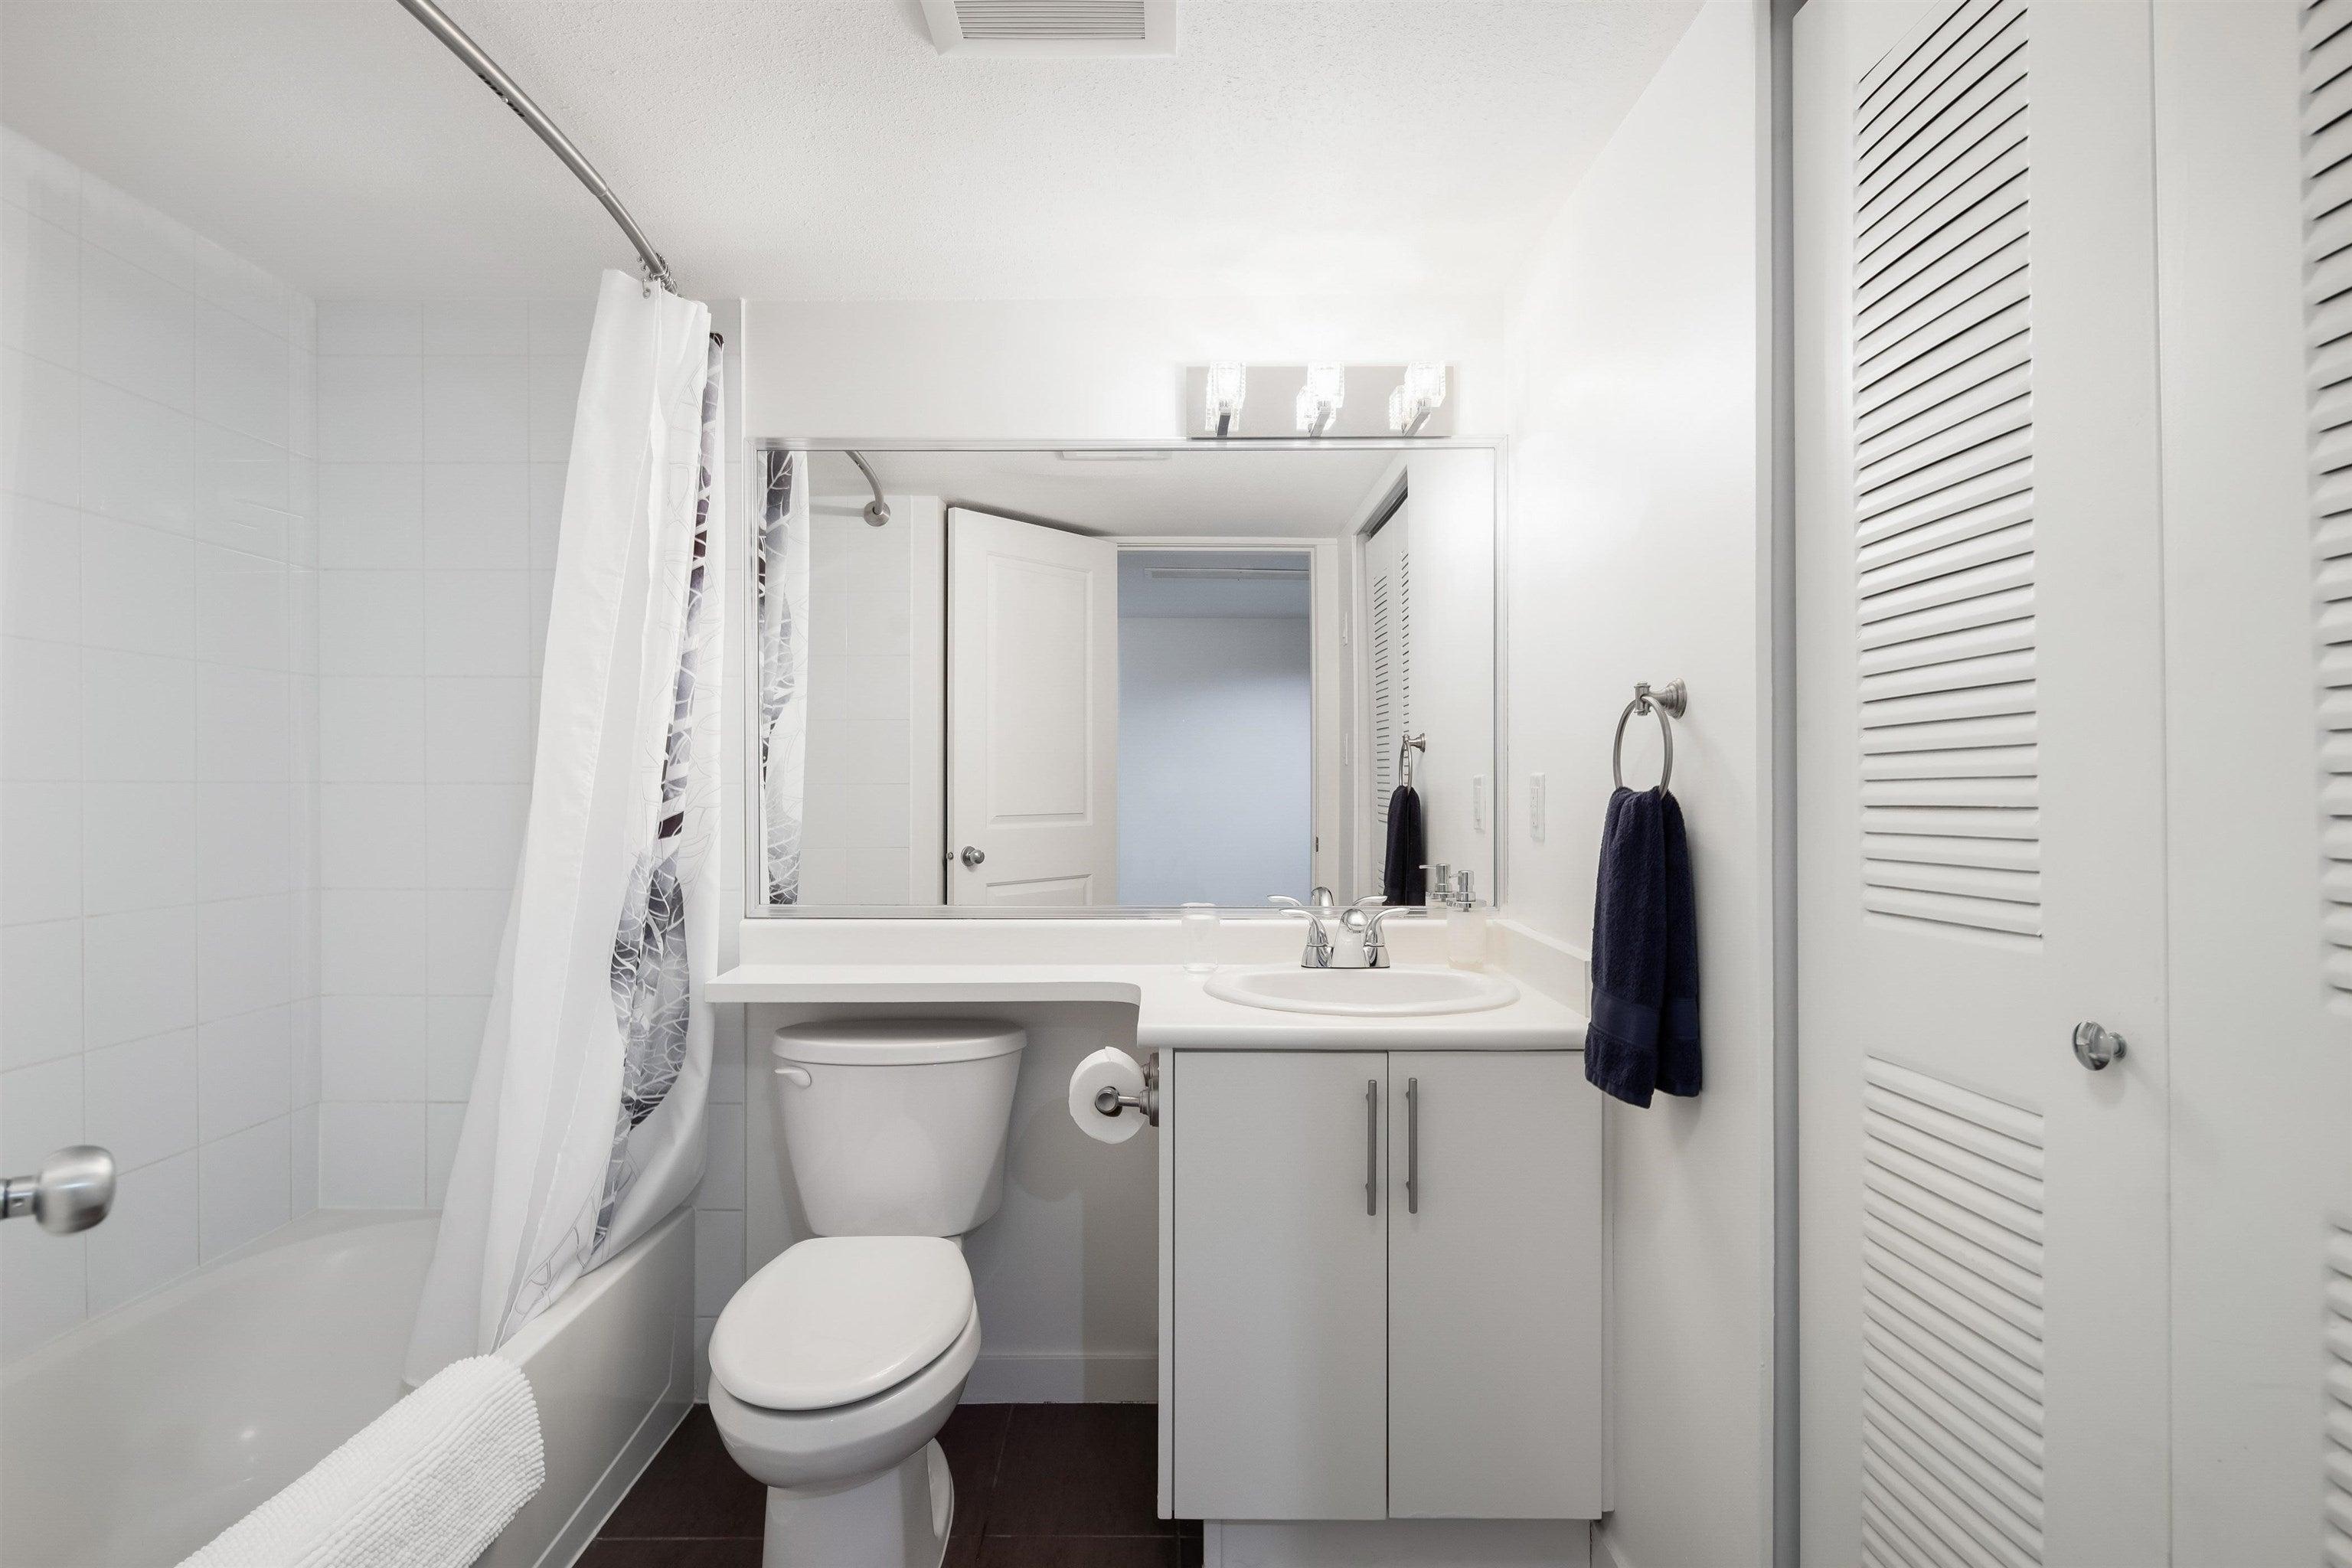 2258 WINDRIDGE DRIVE - Seymour NV House/Single Family for sale, 5 Bedrooms (R2617156) - #35